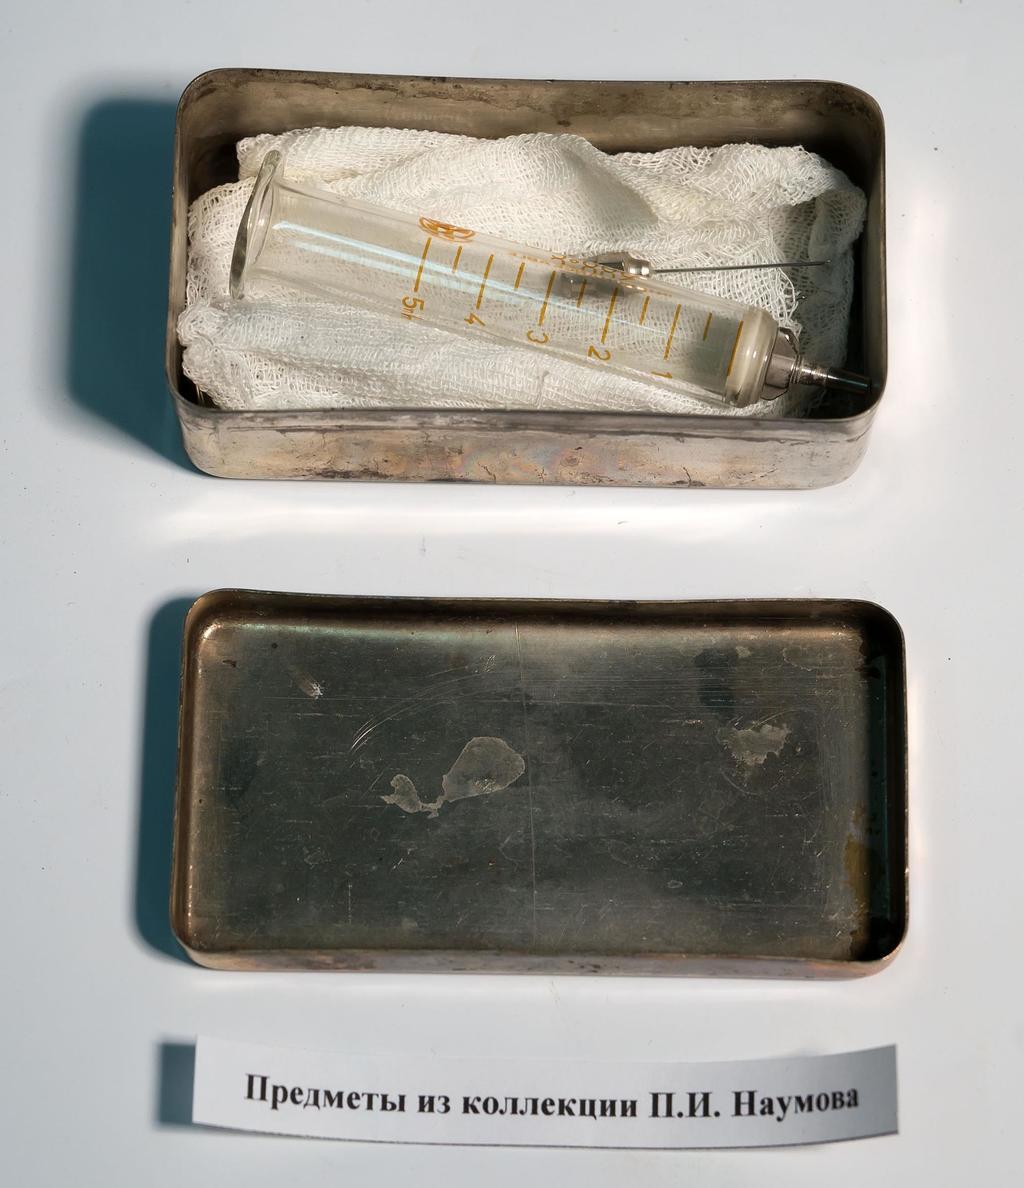 Фото №240. Коробка с медицинскими инструментами. СССР. 1940-е. Металл